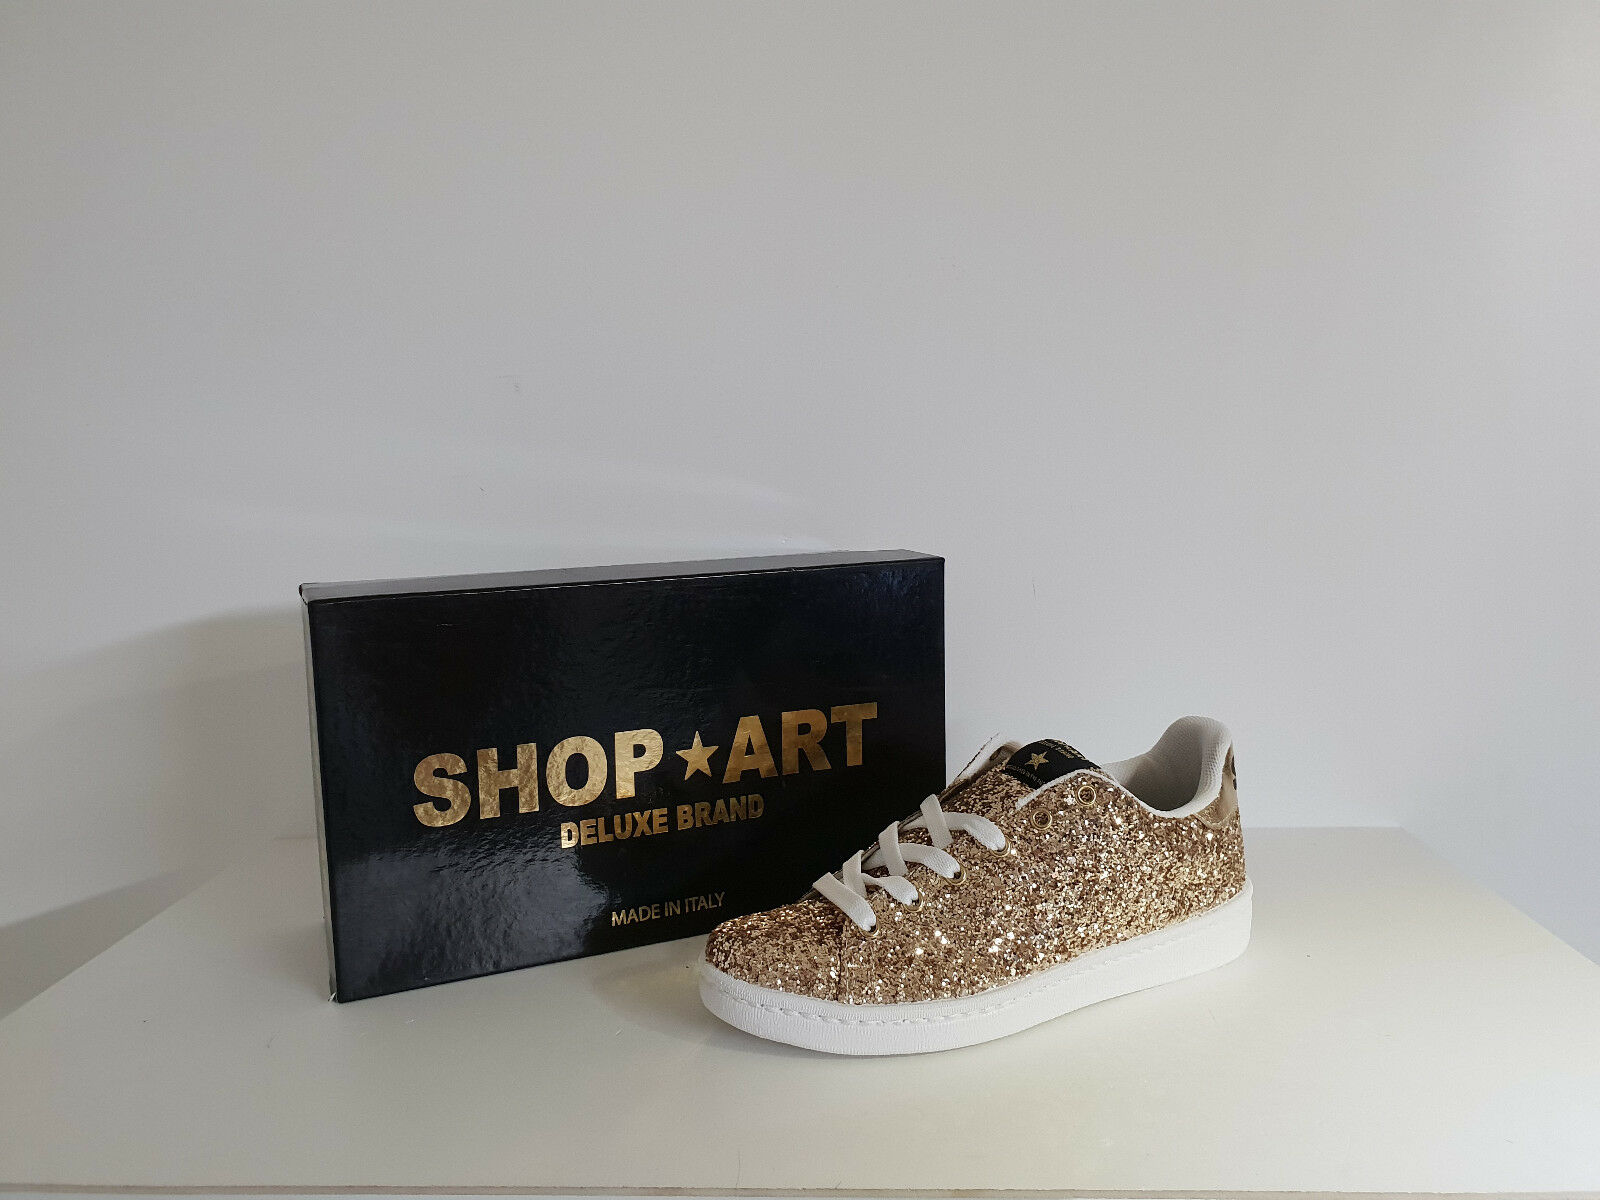 Shop Brt Frau Turnschuhe Rabatt - 50 % art. sa - 8043 - Far. Gold glitter